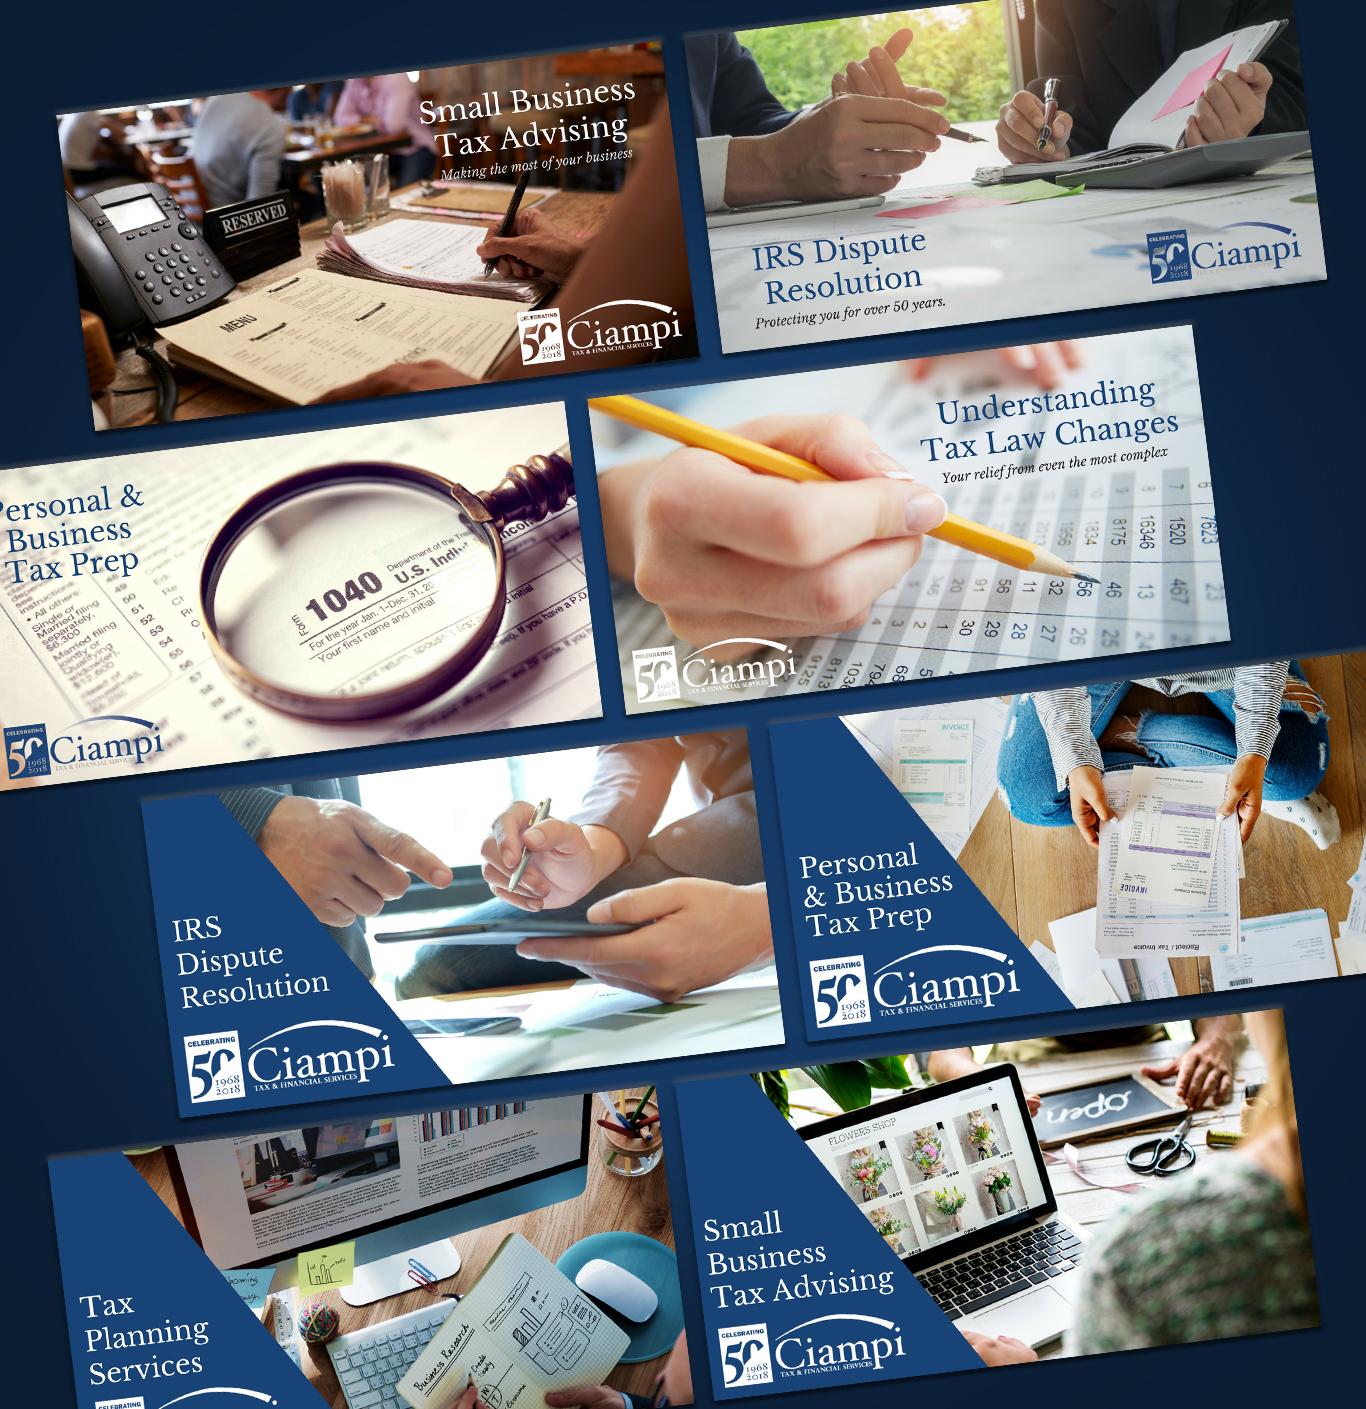 Ciampi Tax & Financial Services Social Marketing